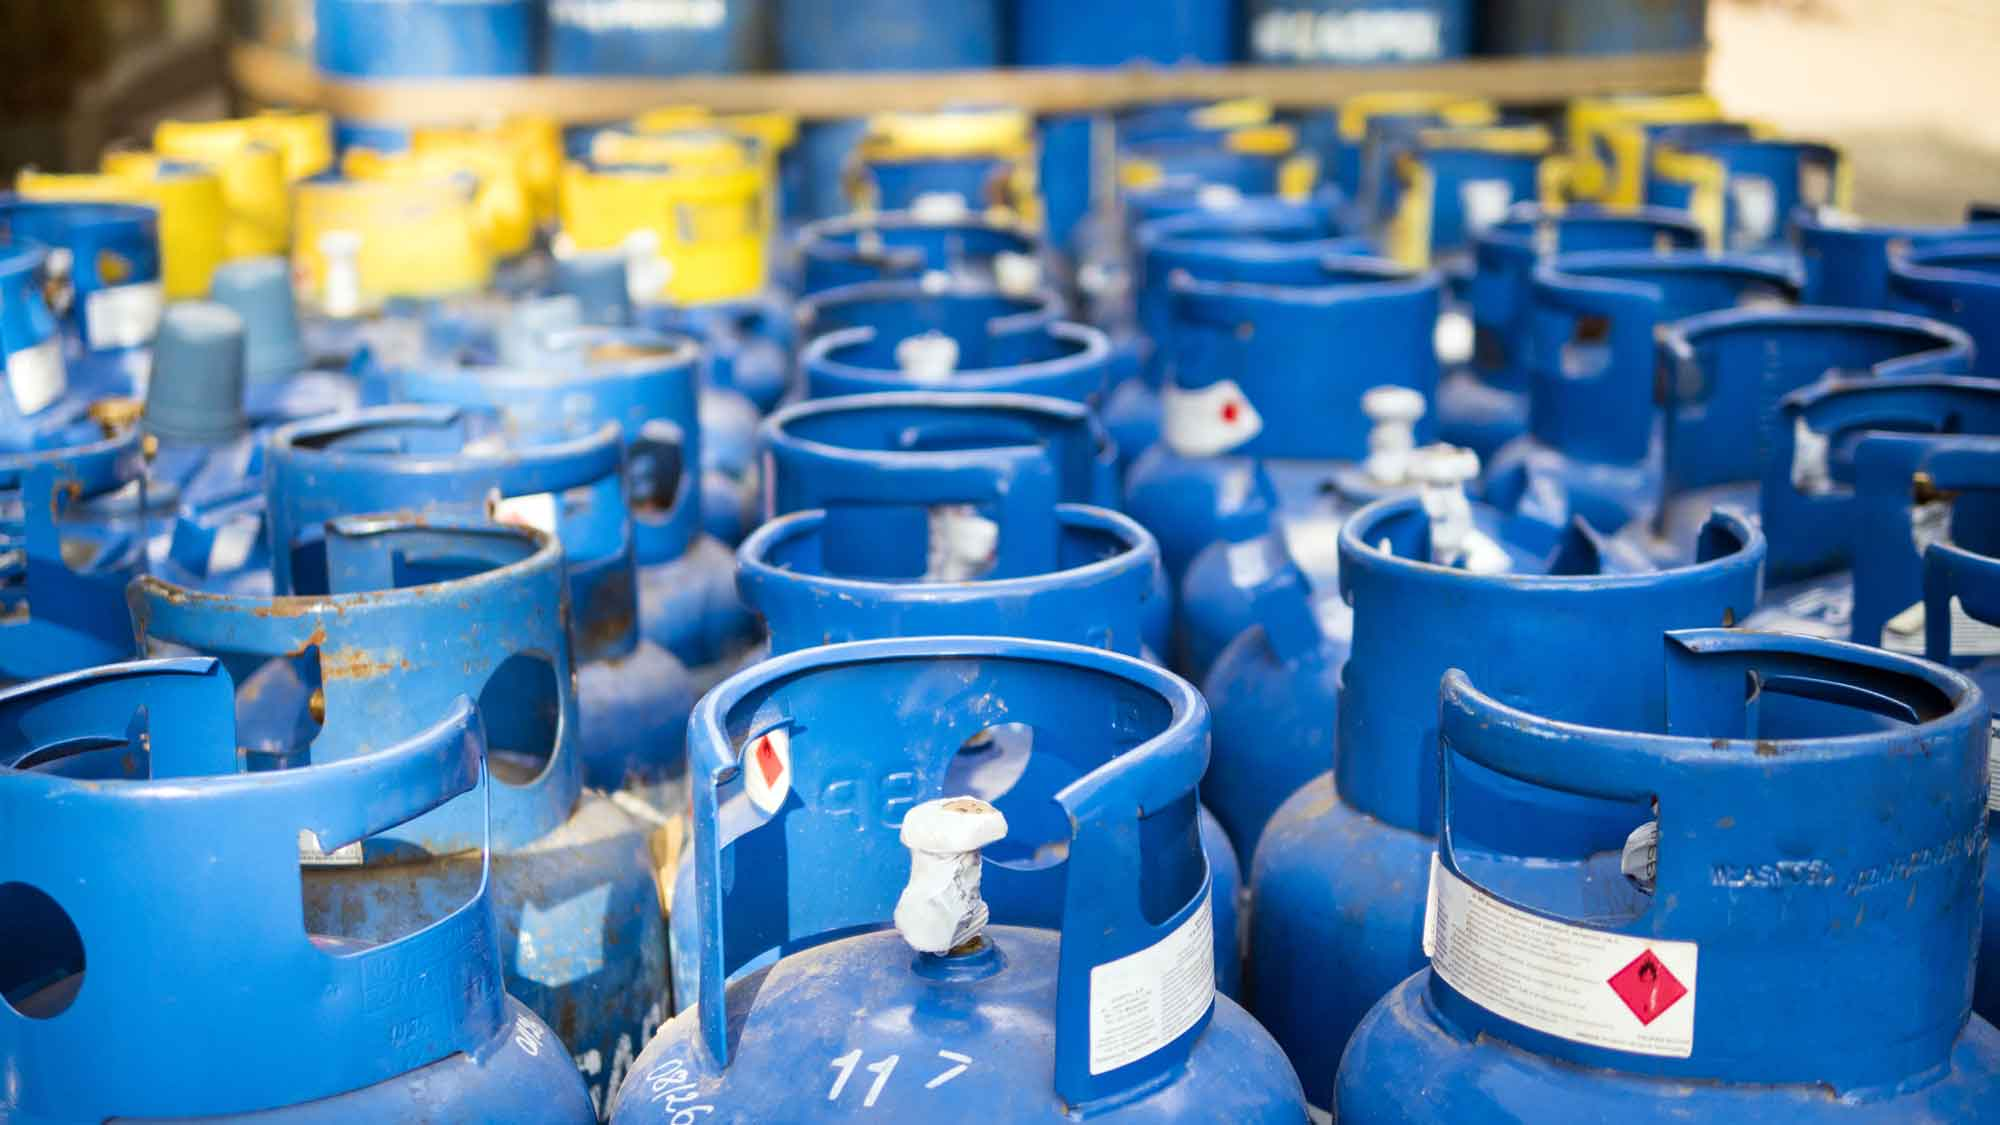 lpg boiler engineer essex maintenance leigh on sea blue tanks